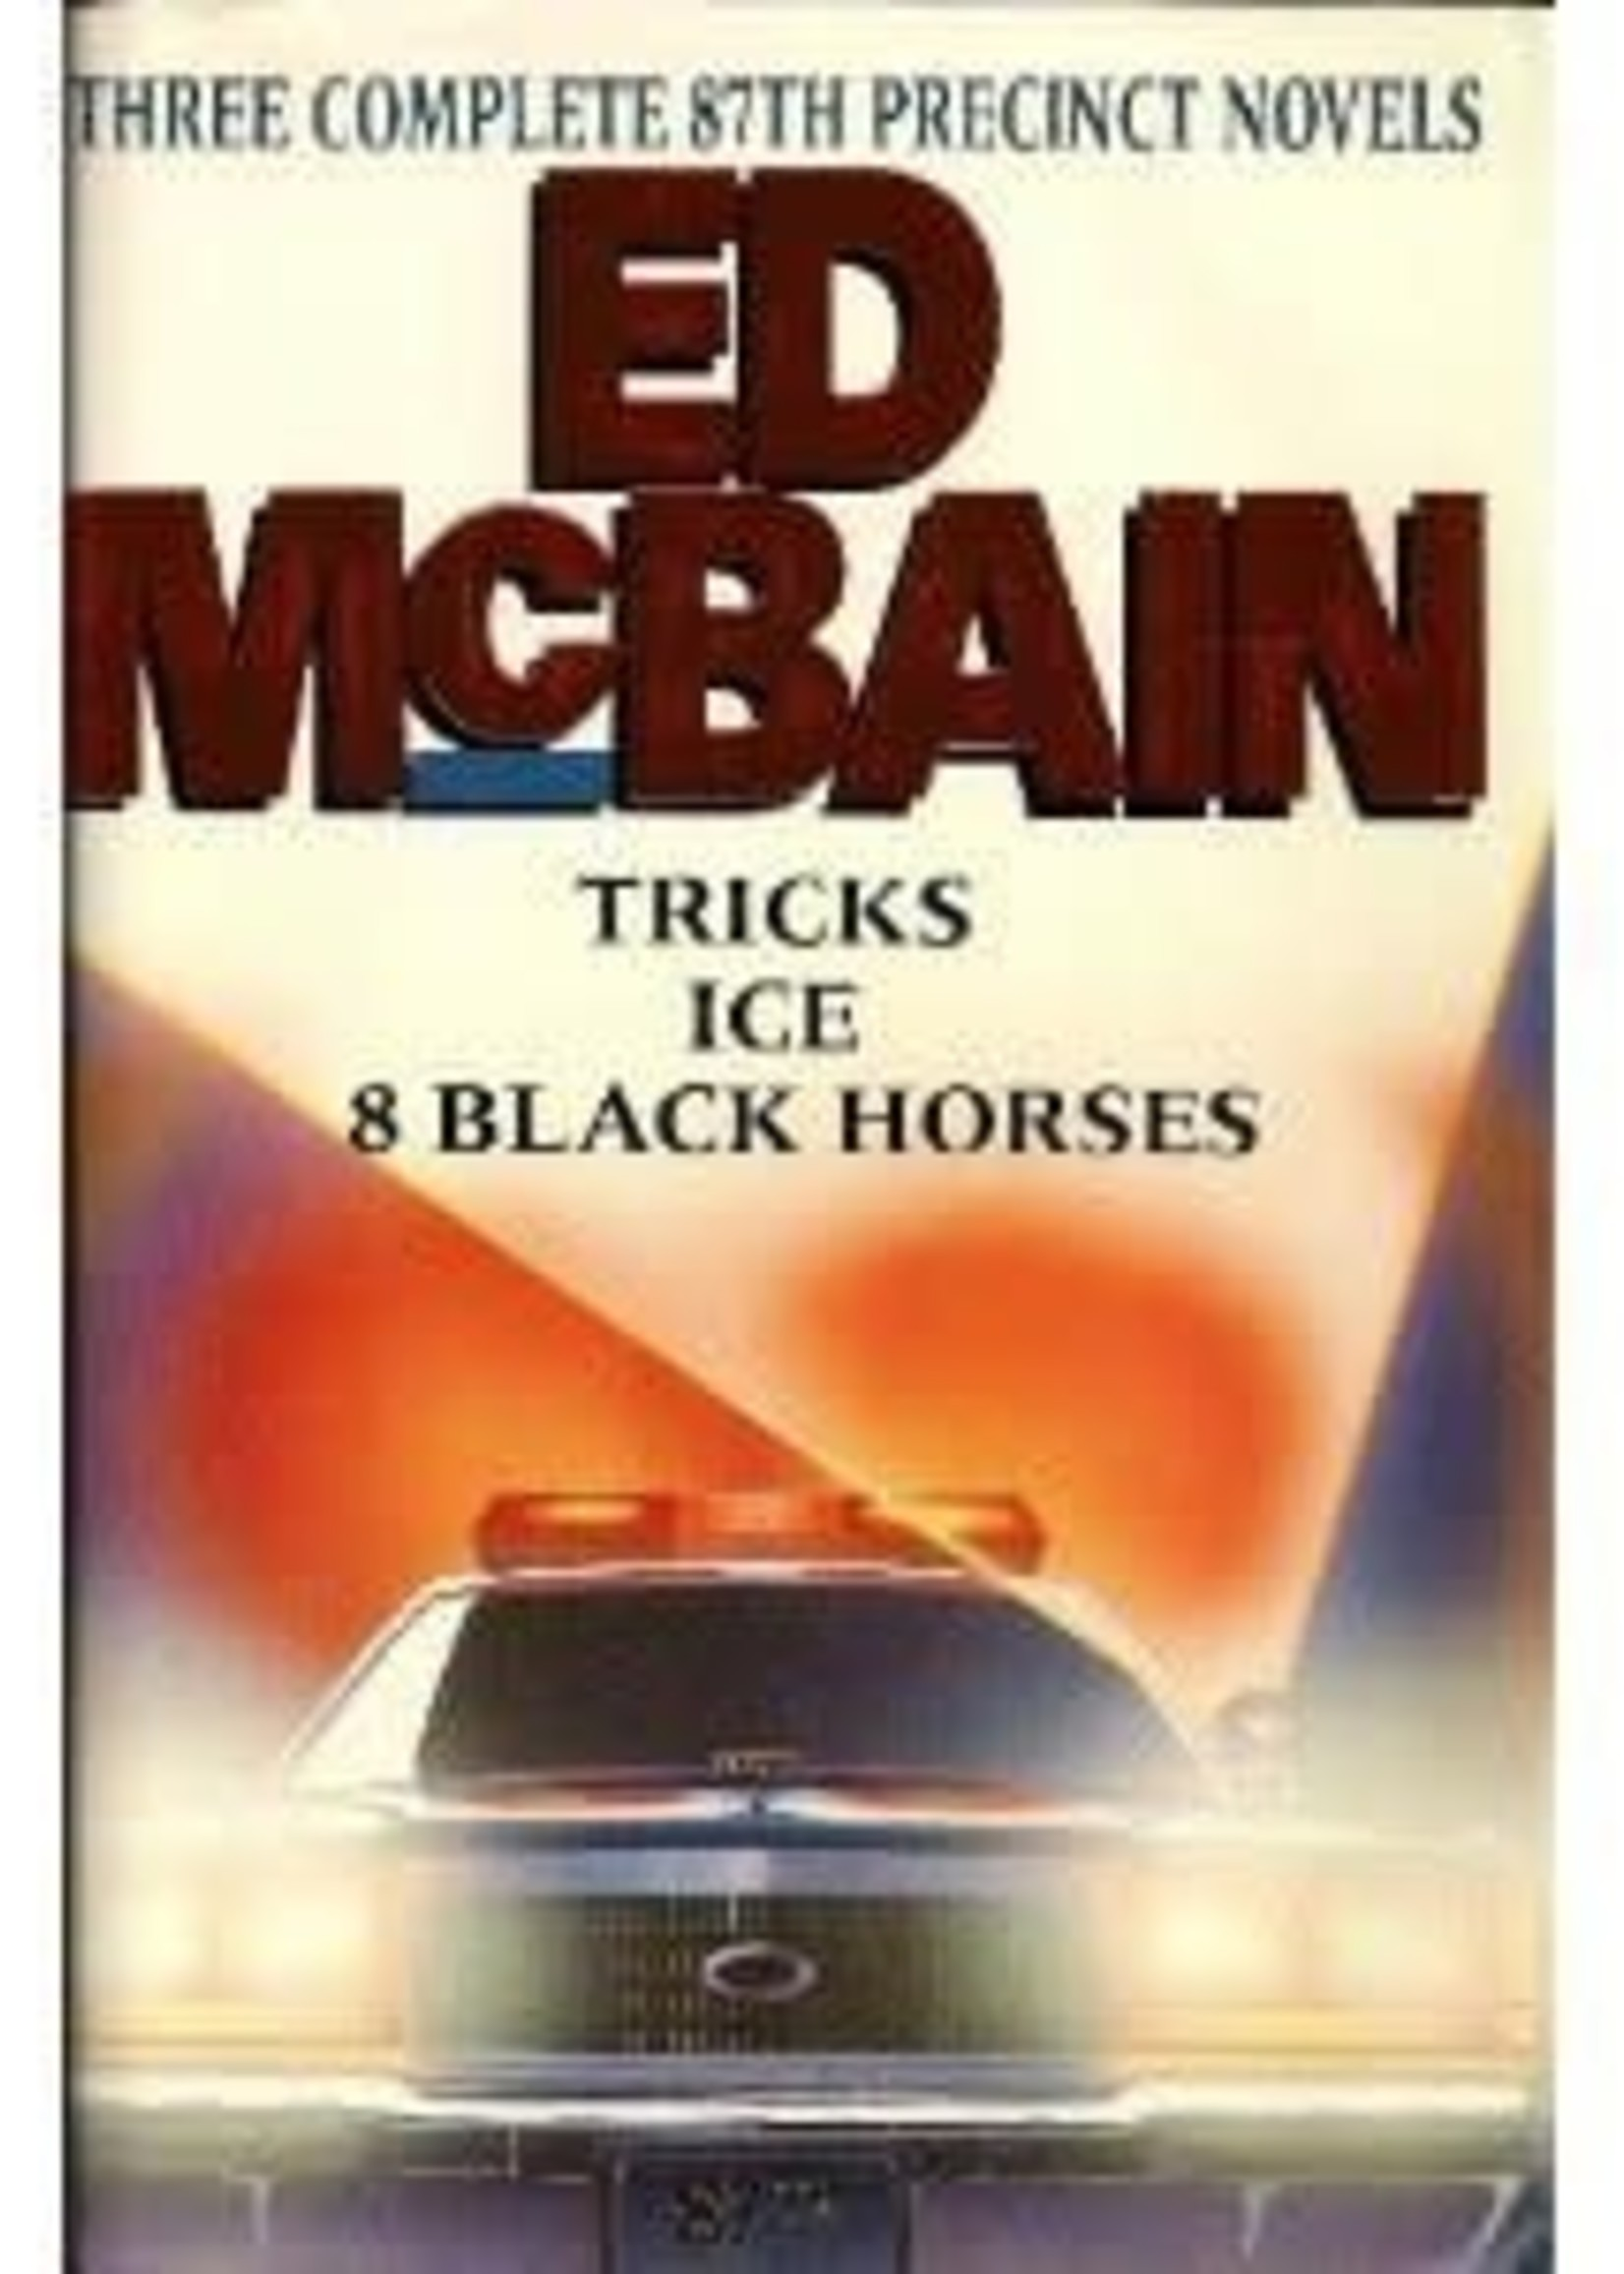 USED - Three Complete 87th Precinct Novels: Tricks, Ice, 8 Black Horses by Ed McBain